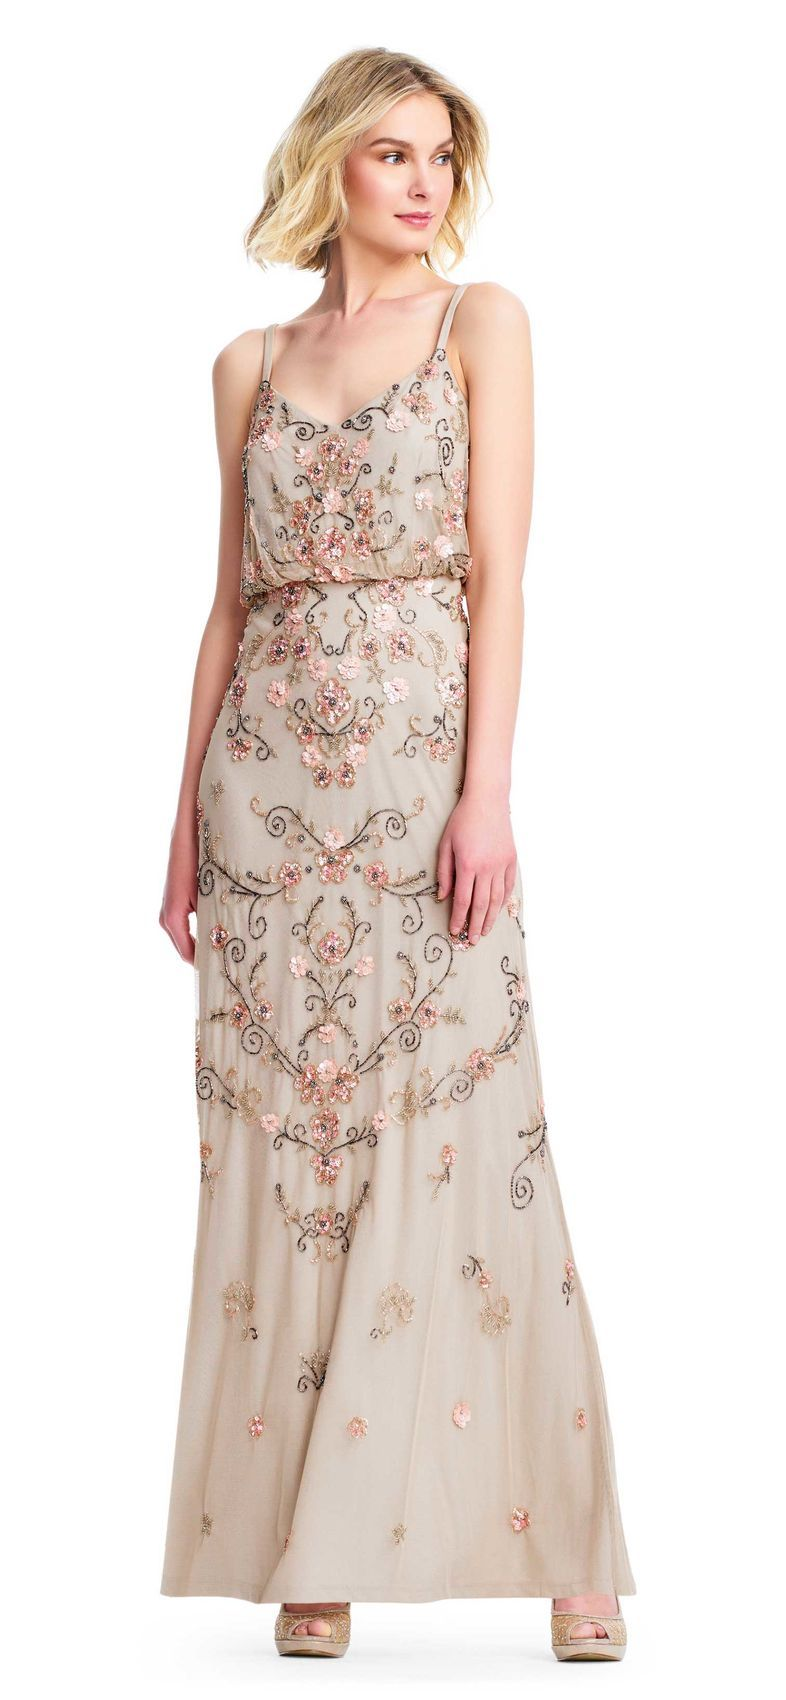 Boho floral beaded blouson gown project wedding dress pinterest